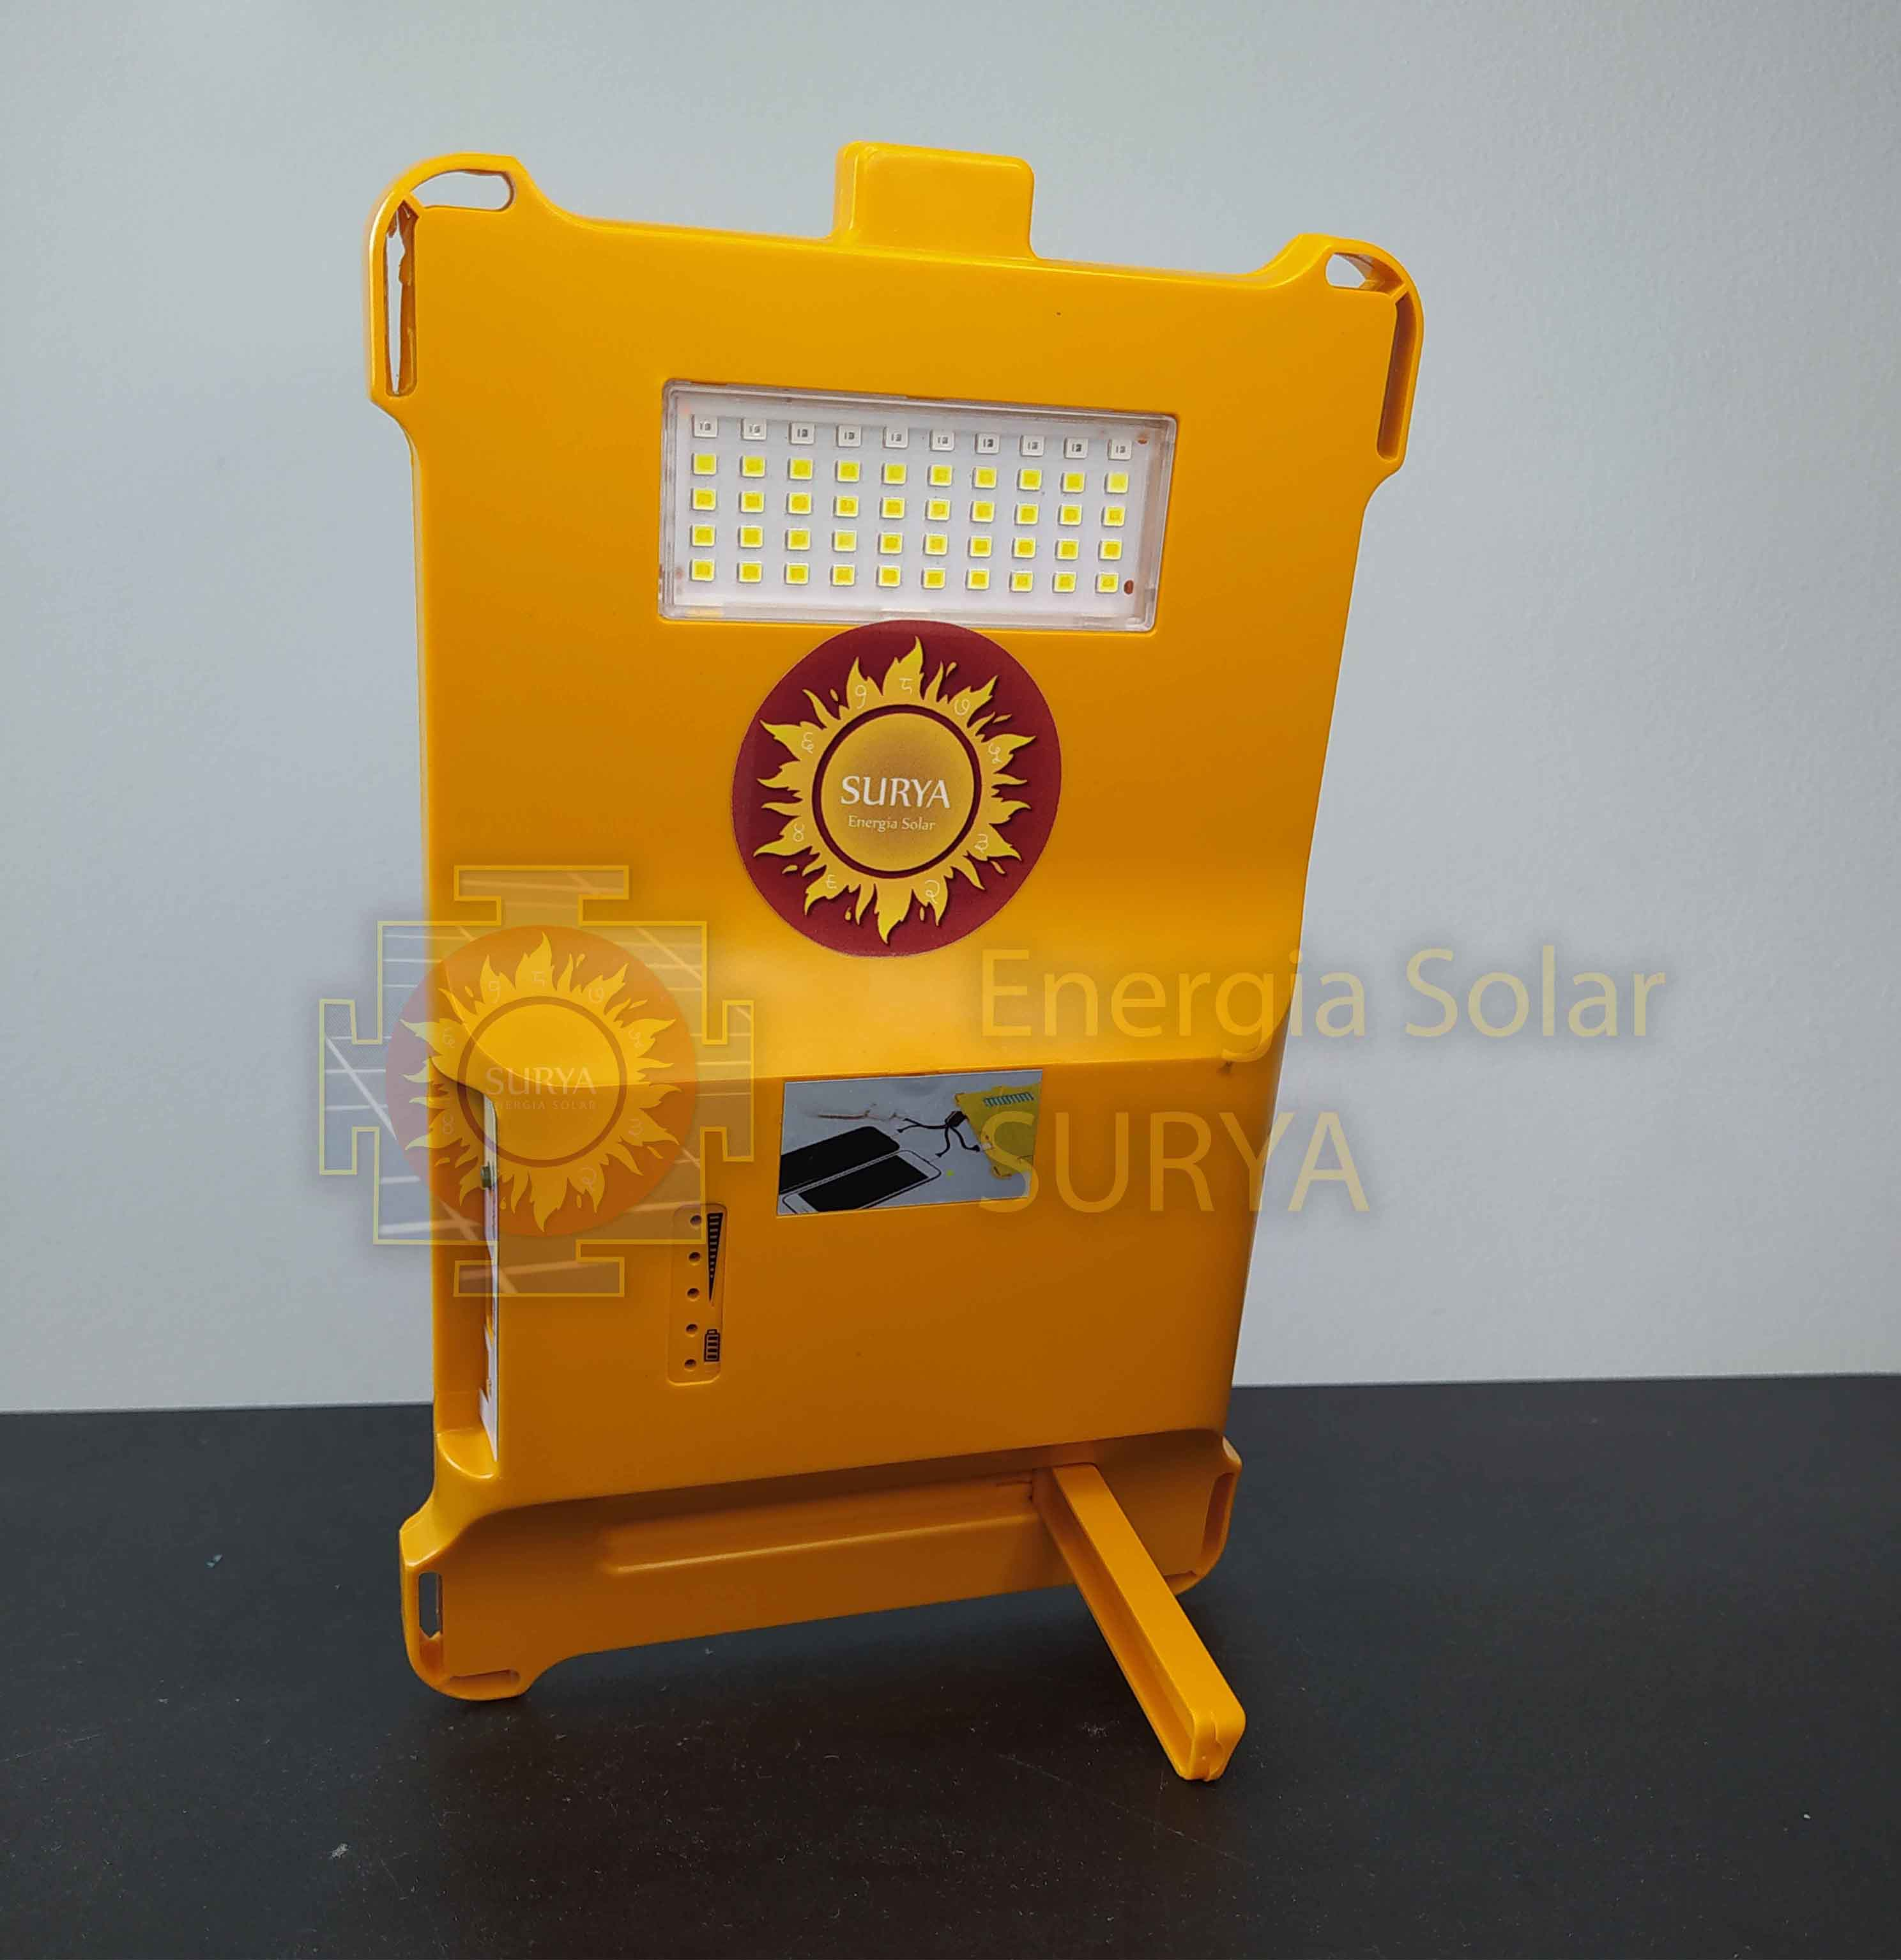 Energia solar para iluminacion pequeña y cargar celular 4